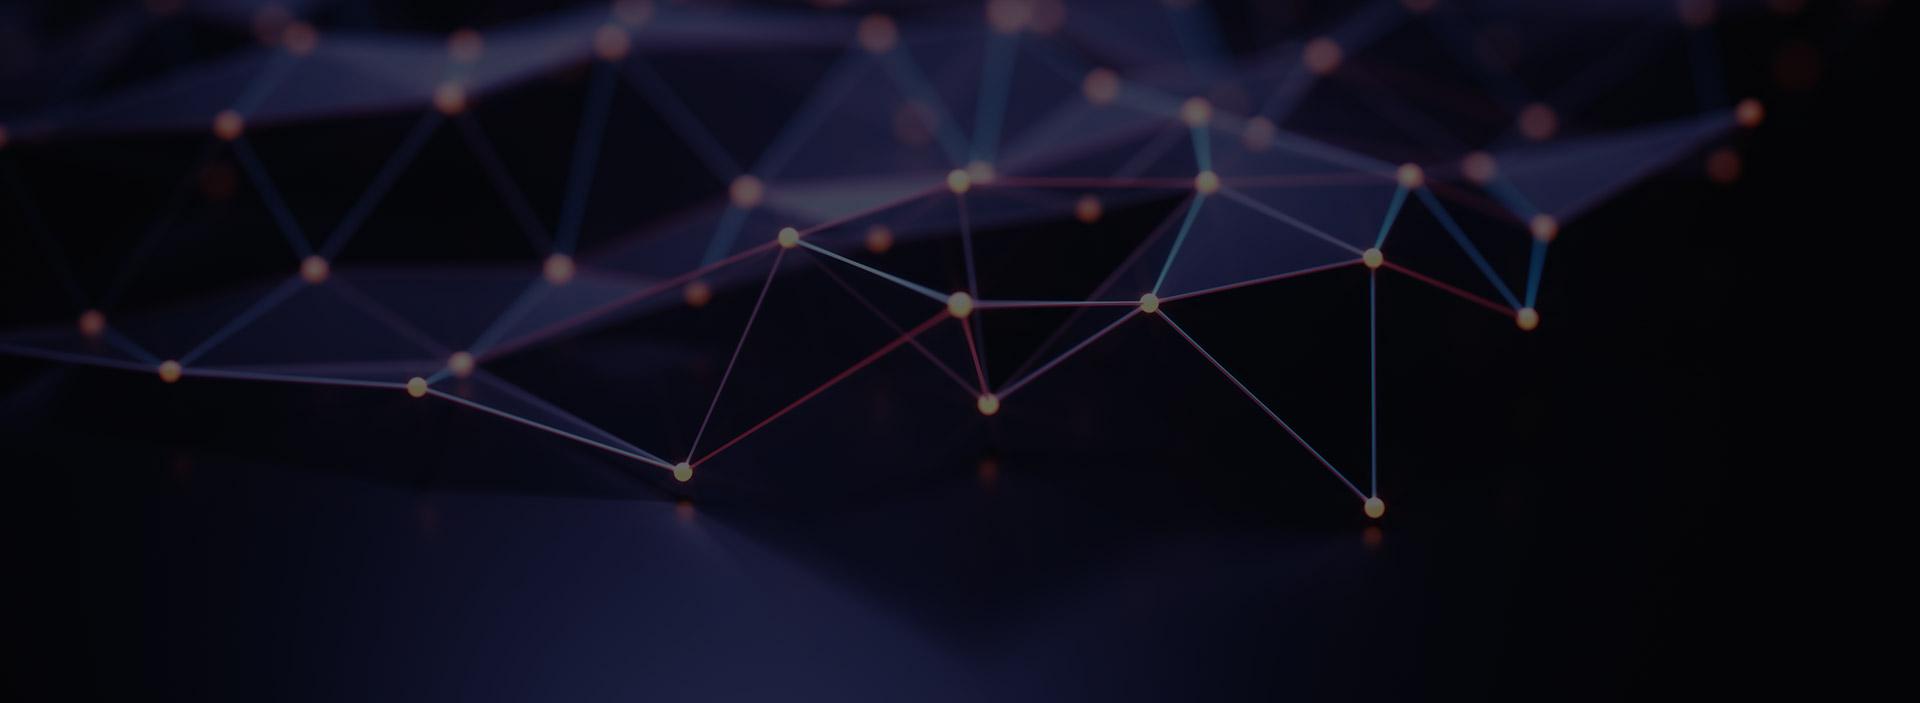 Top 3 platforms for successful smart contract development